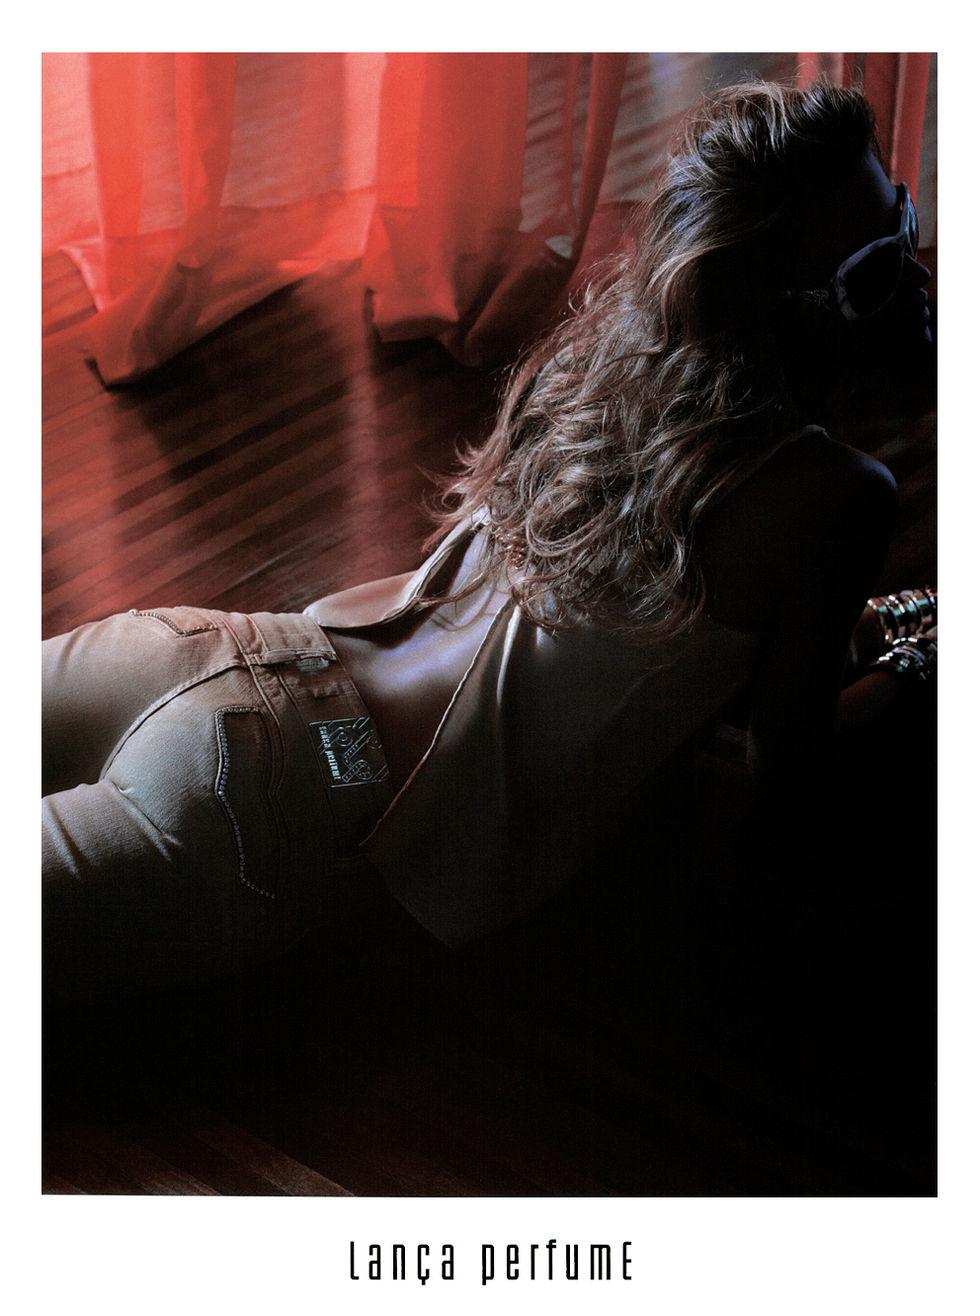 ana-beatriz-barros-lanca-perfume-ads-01